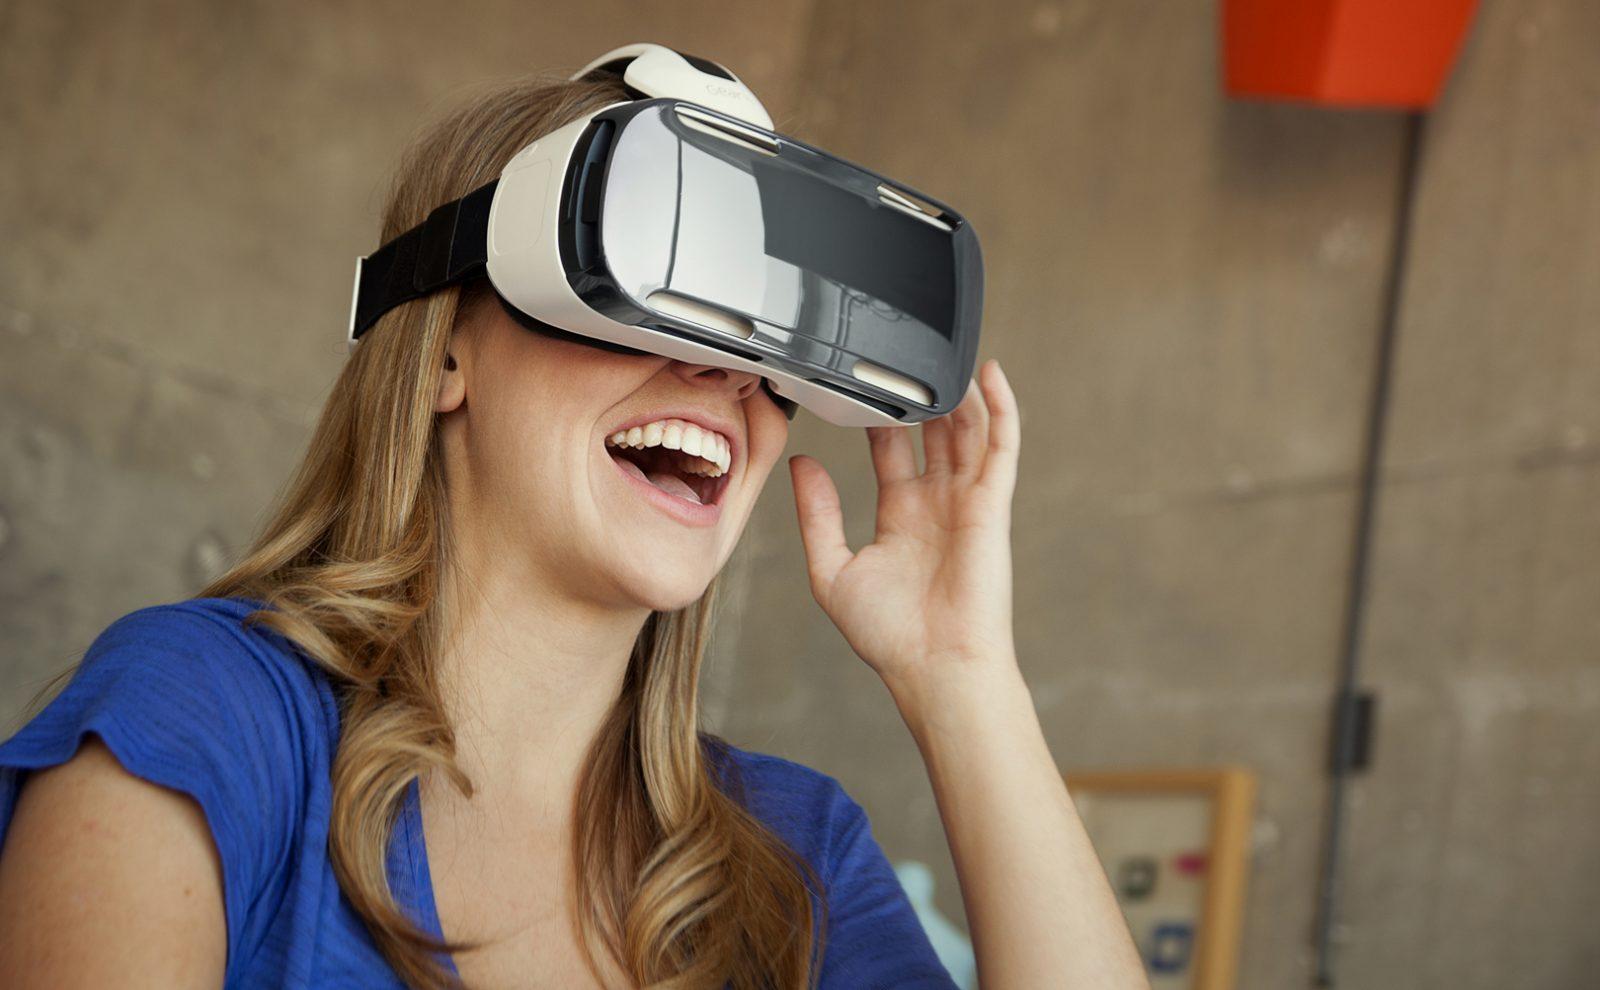 casque-realite-virtuelle-1600x990.jpg